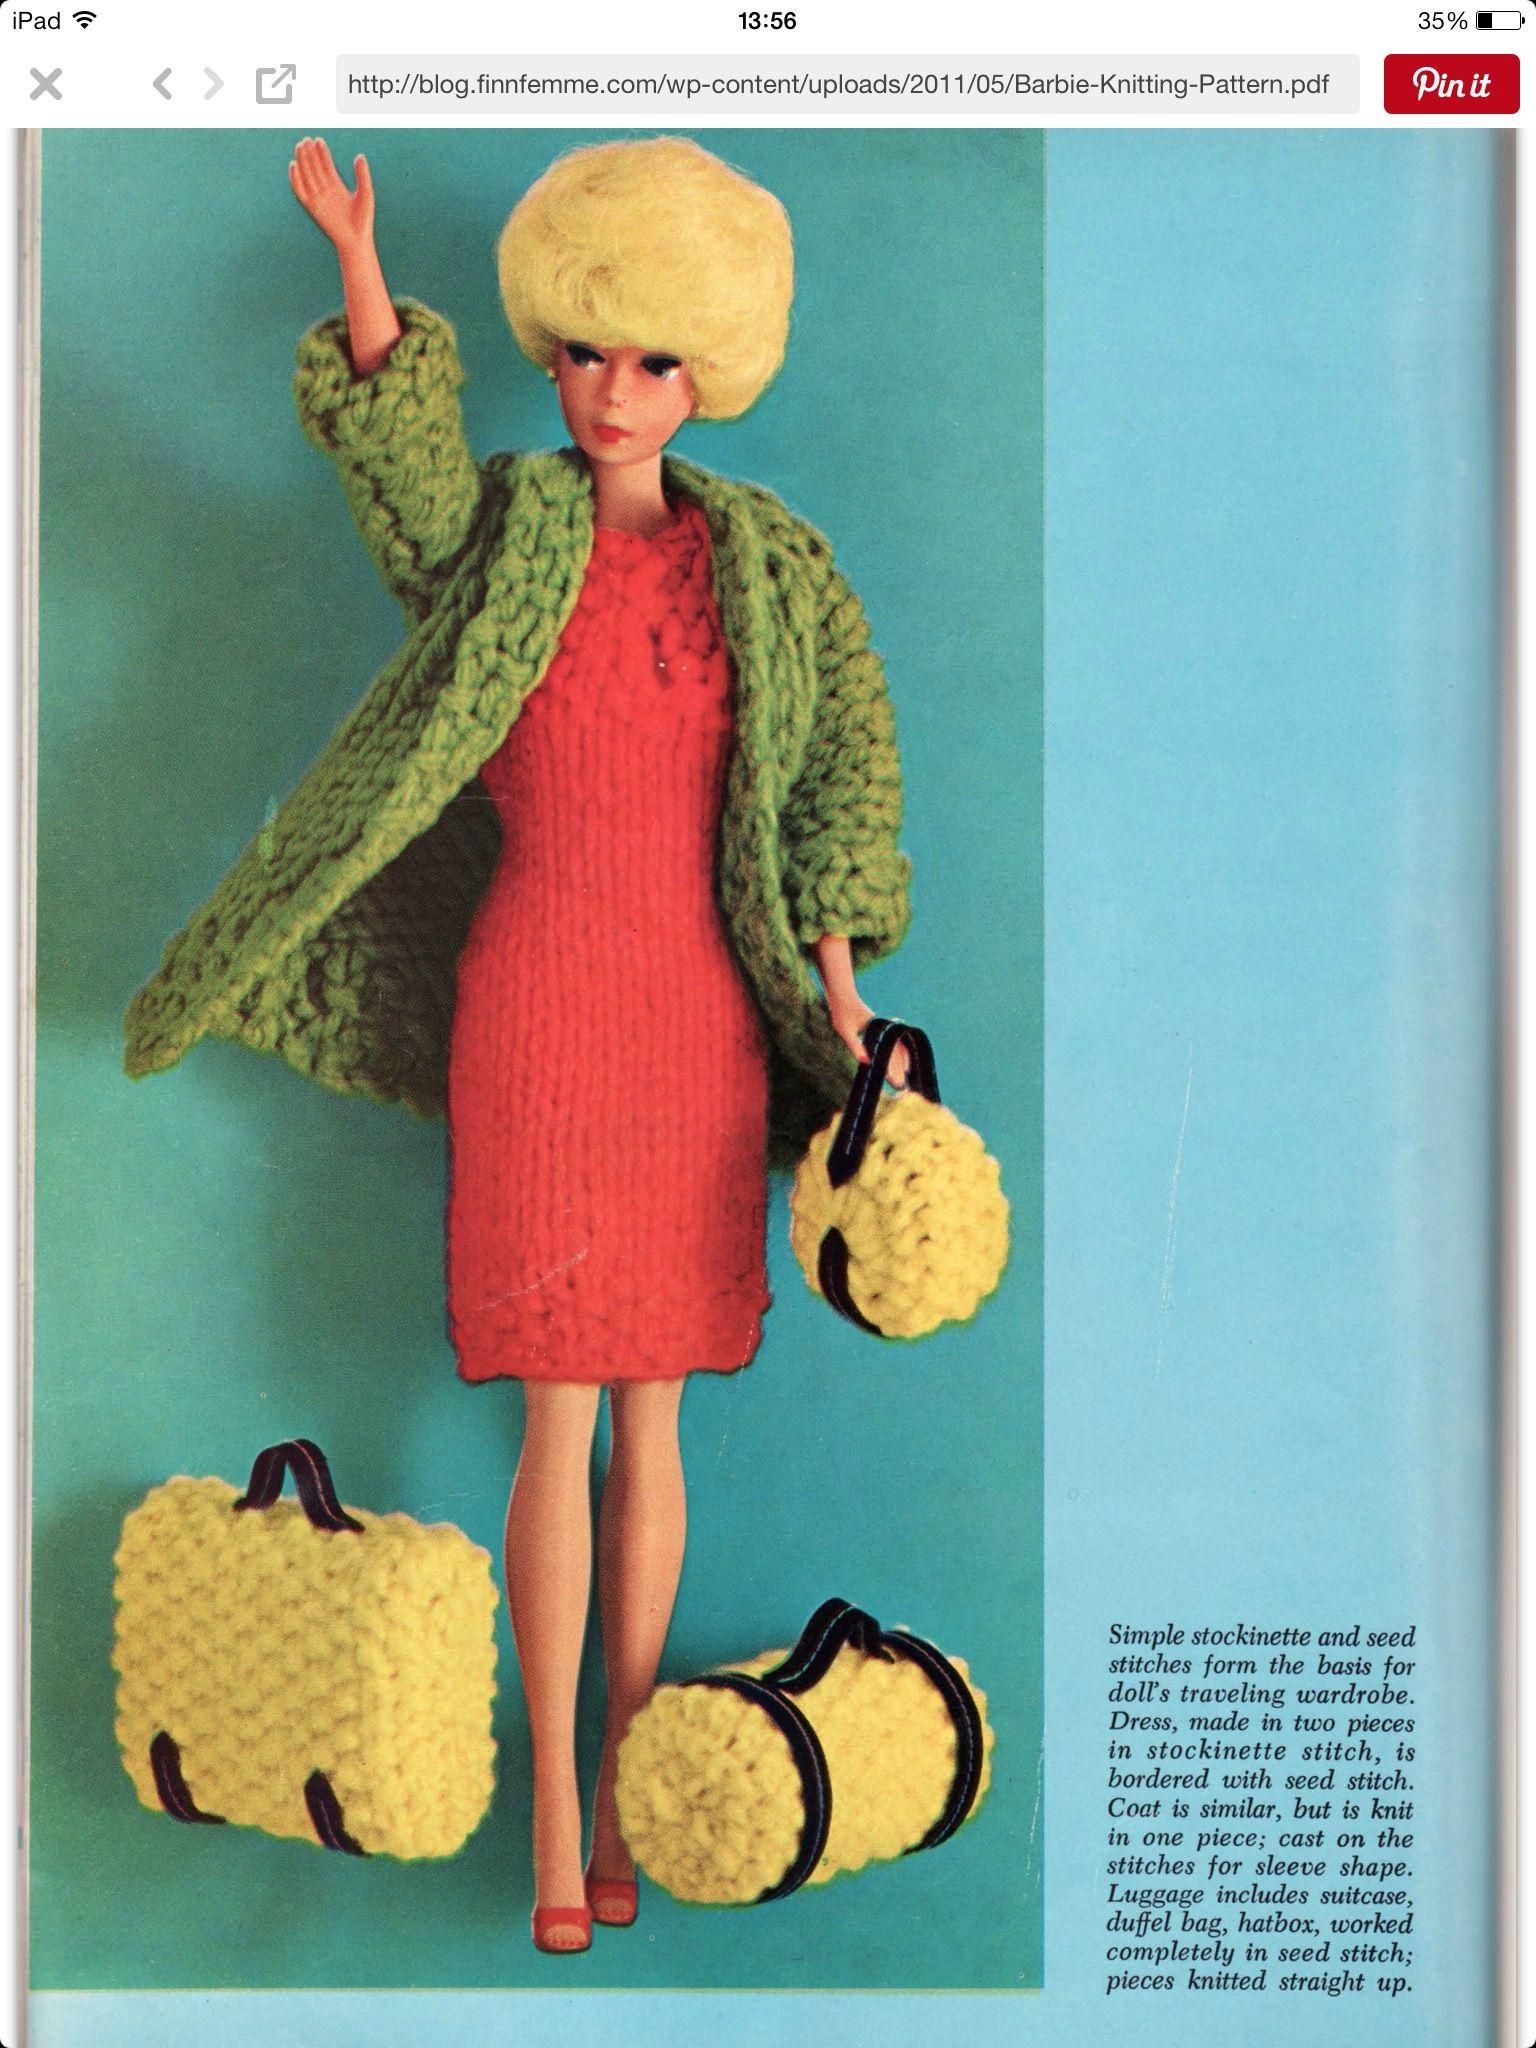 Pin by Dawn Blacker on Barbie knitting ideas & patterns   Pinterest ...